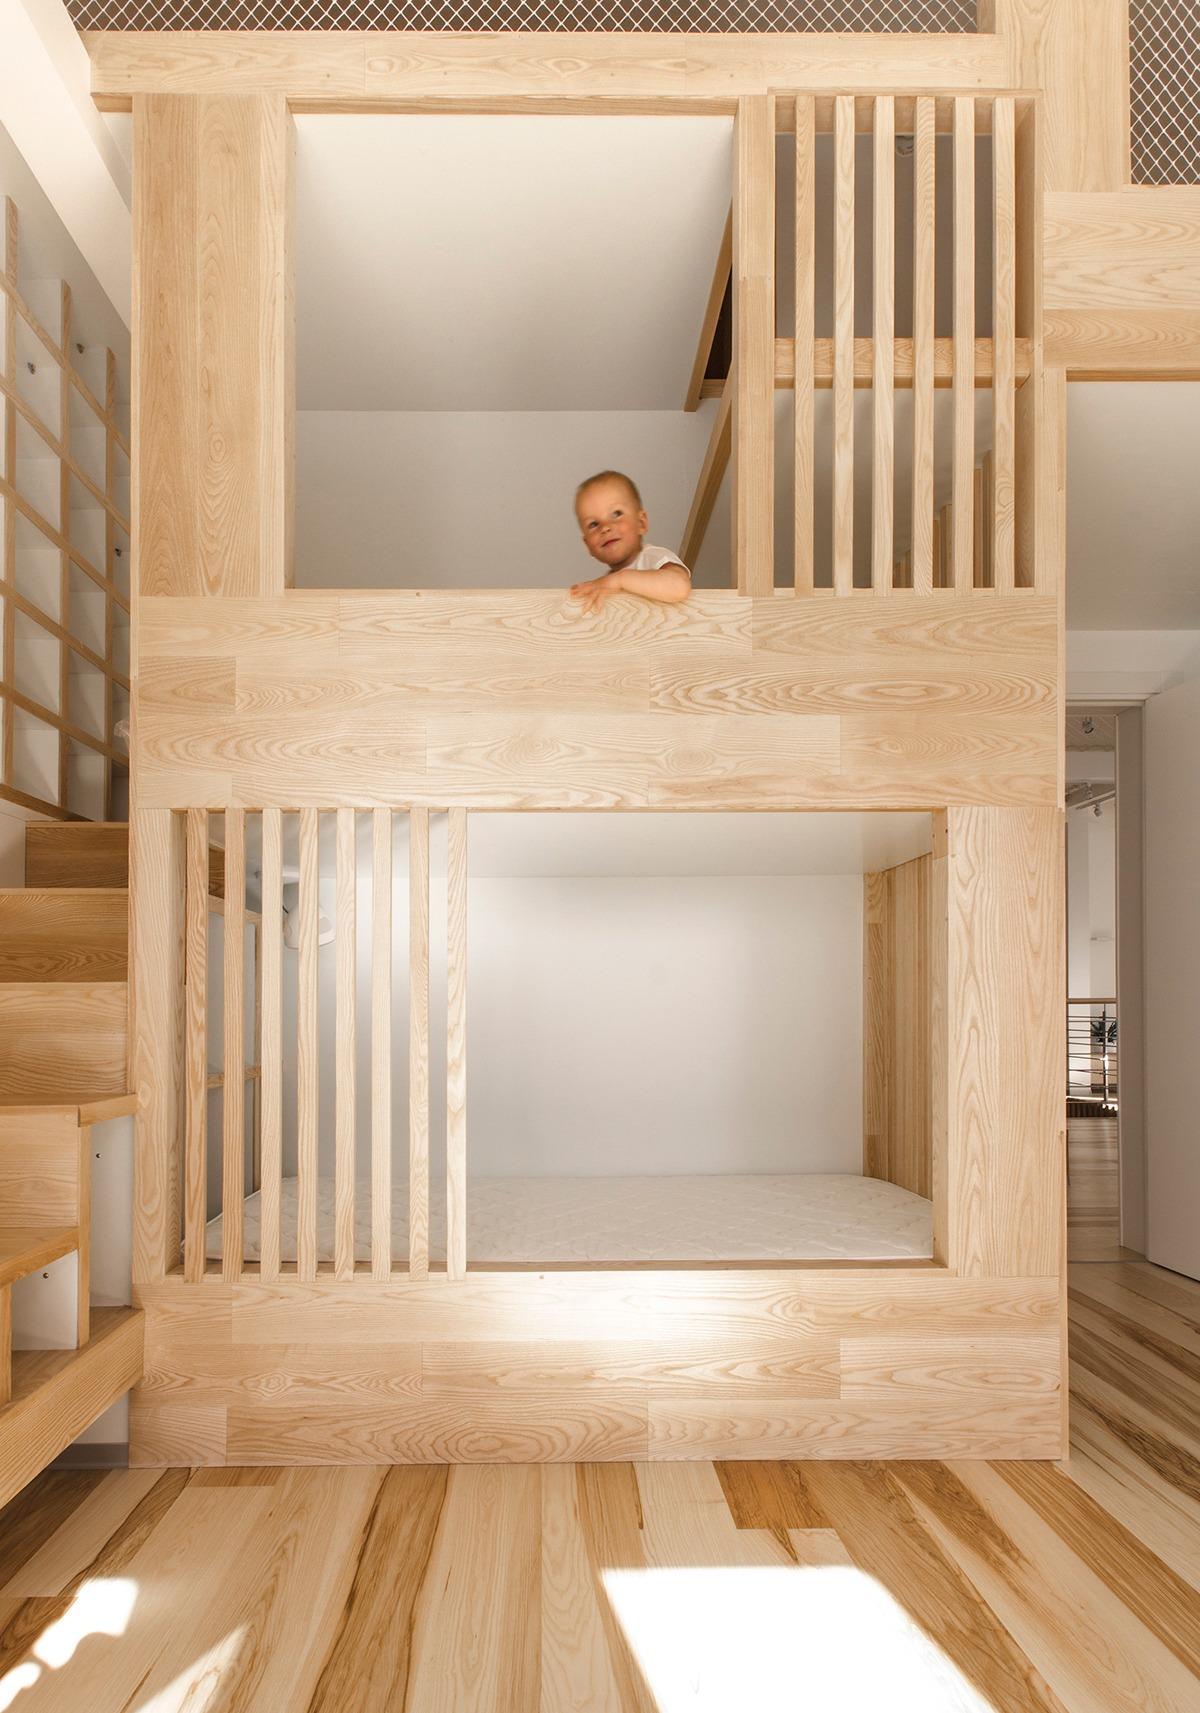 Mezzanine Bedroom Kids Stairs